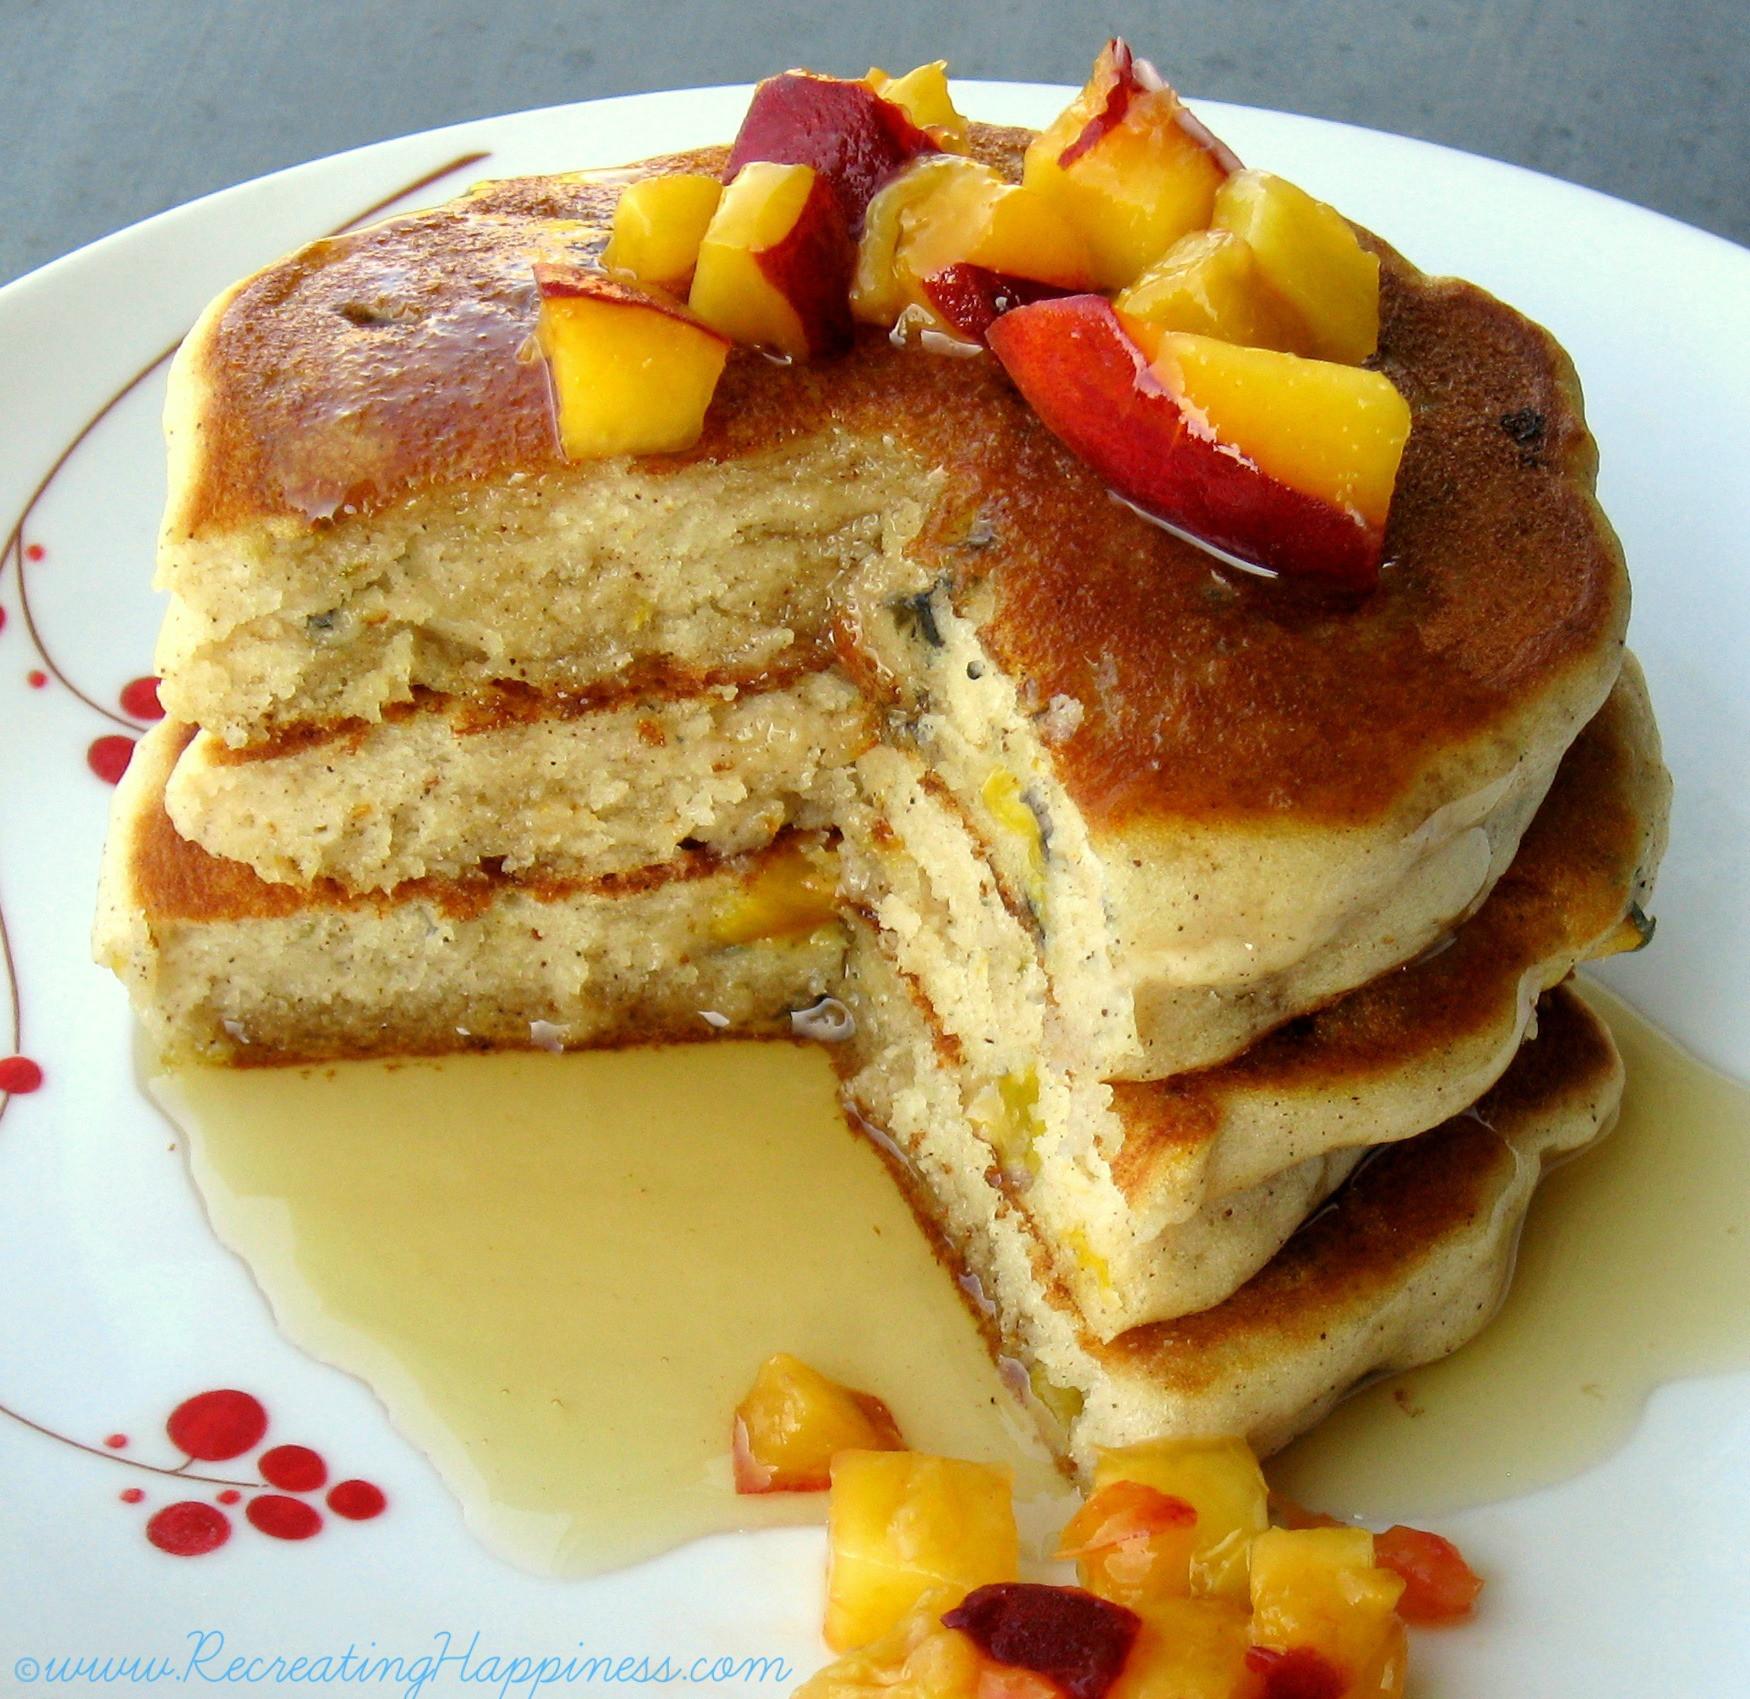 Recipes For Gluten Free Pancakes  Gluten Free Spiced Peach Pancakes Recipe